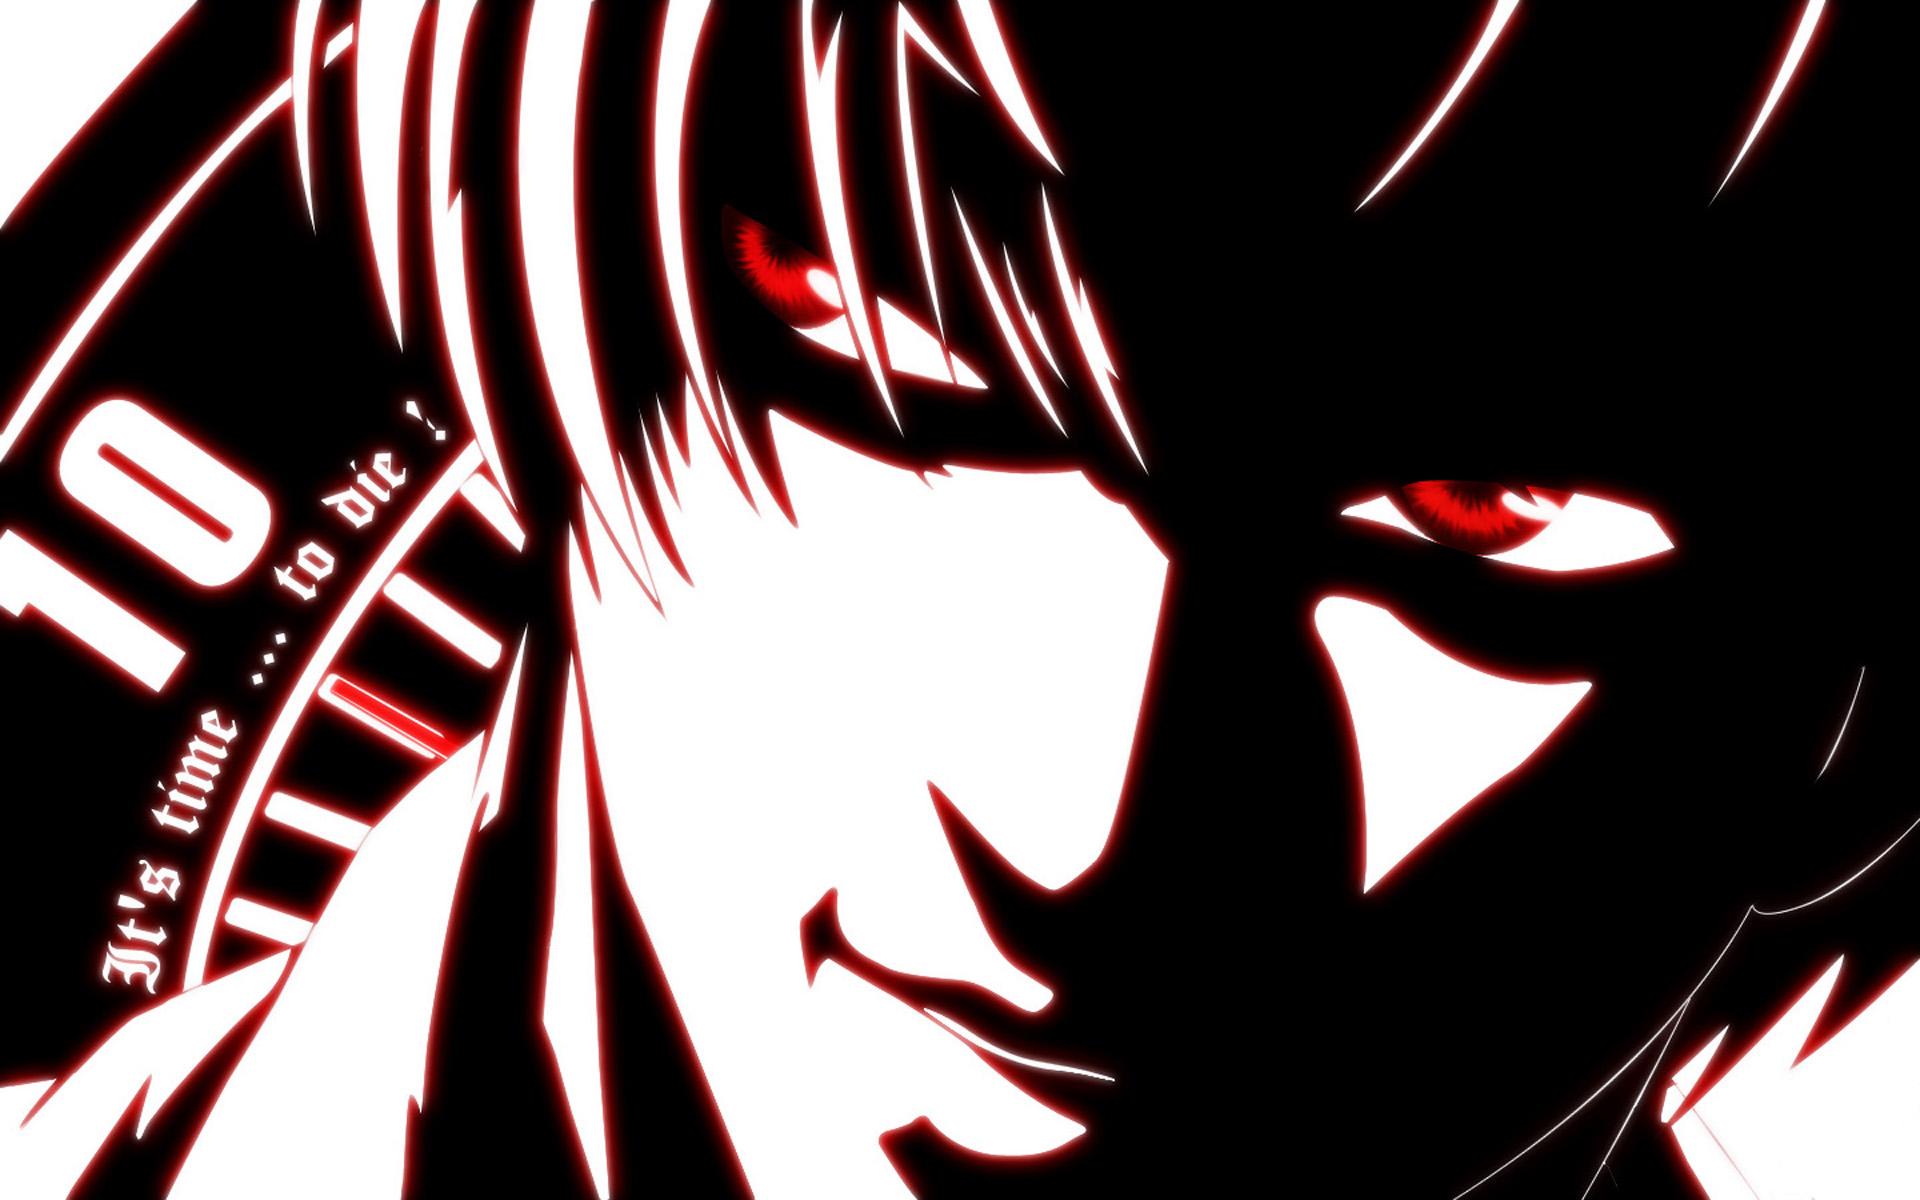 Light Yagami Wallpaper 1920x1200 Wallpapers 1920x1200 1920x1200